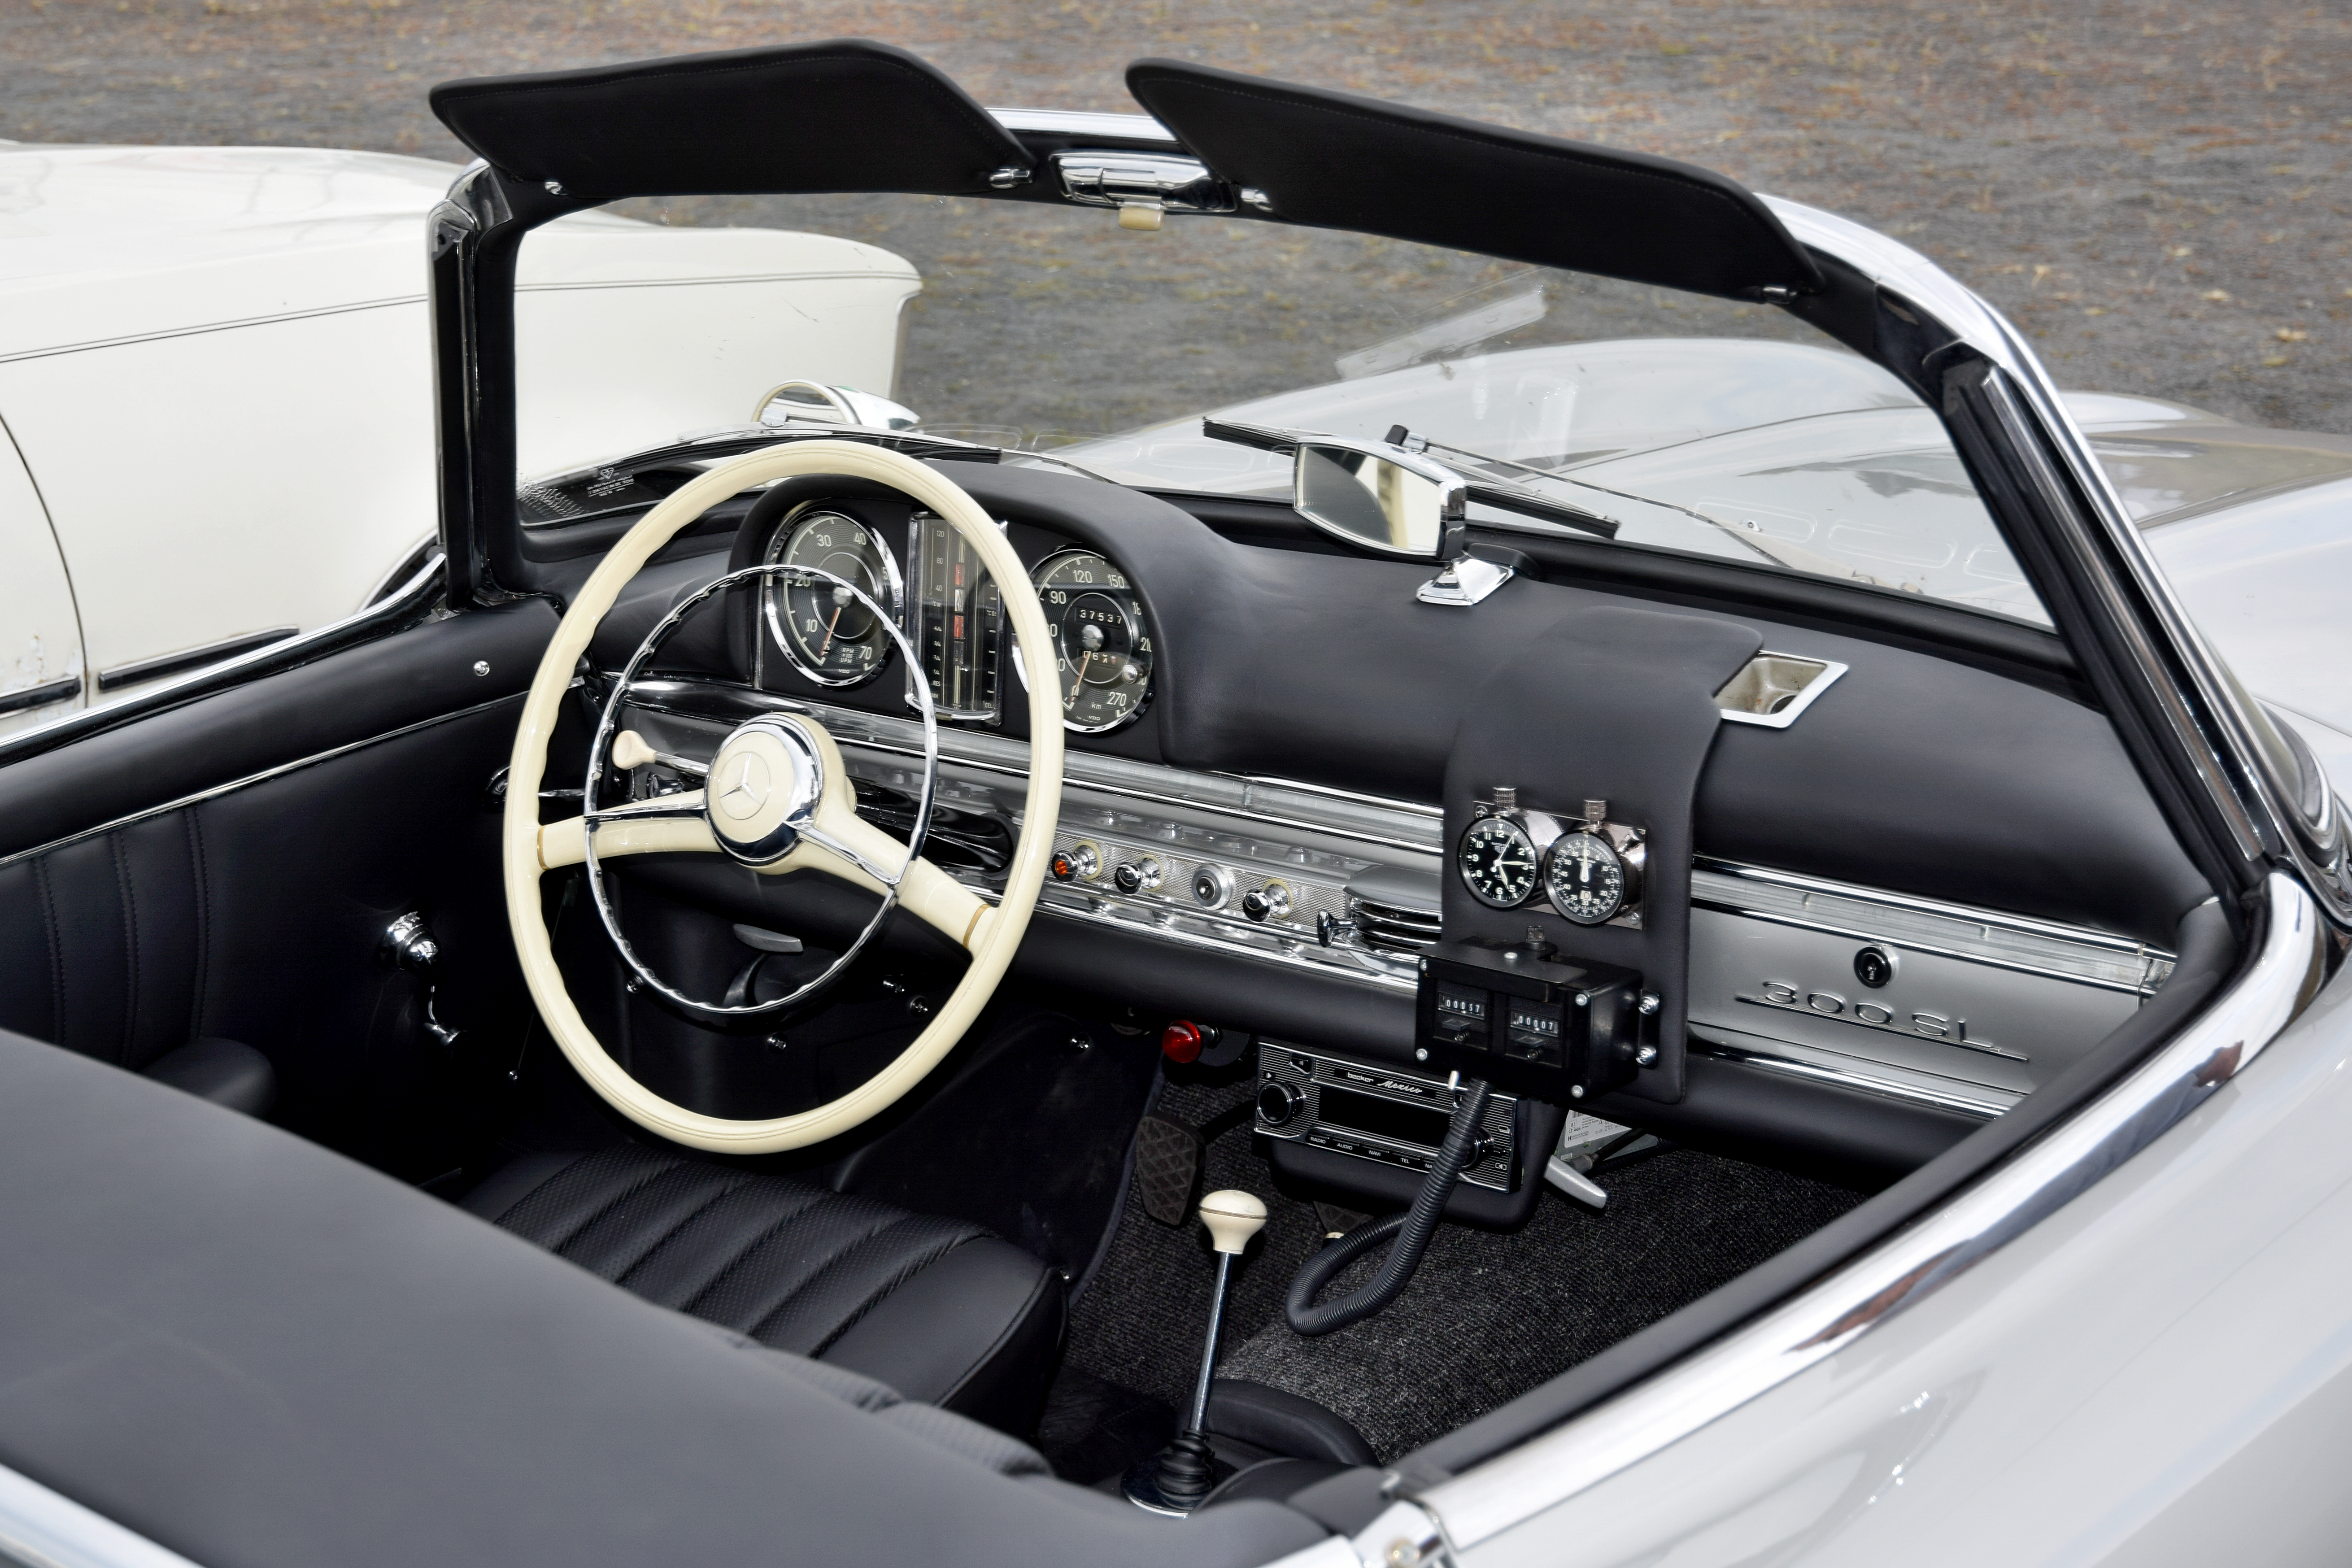 https://upload.wikimedia.org/wikipedia/commons/b/b5/Interieur_Mercedes_300_SL_Cabrio.jpg